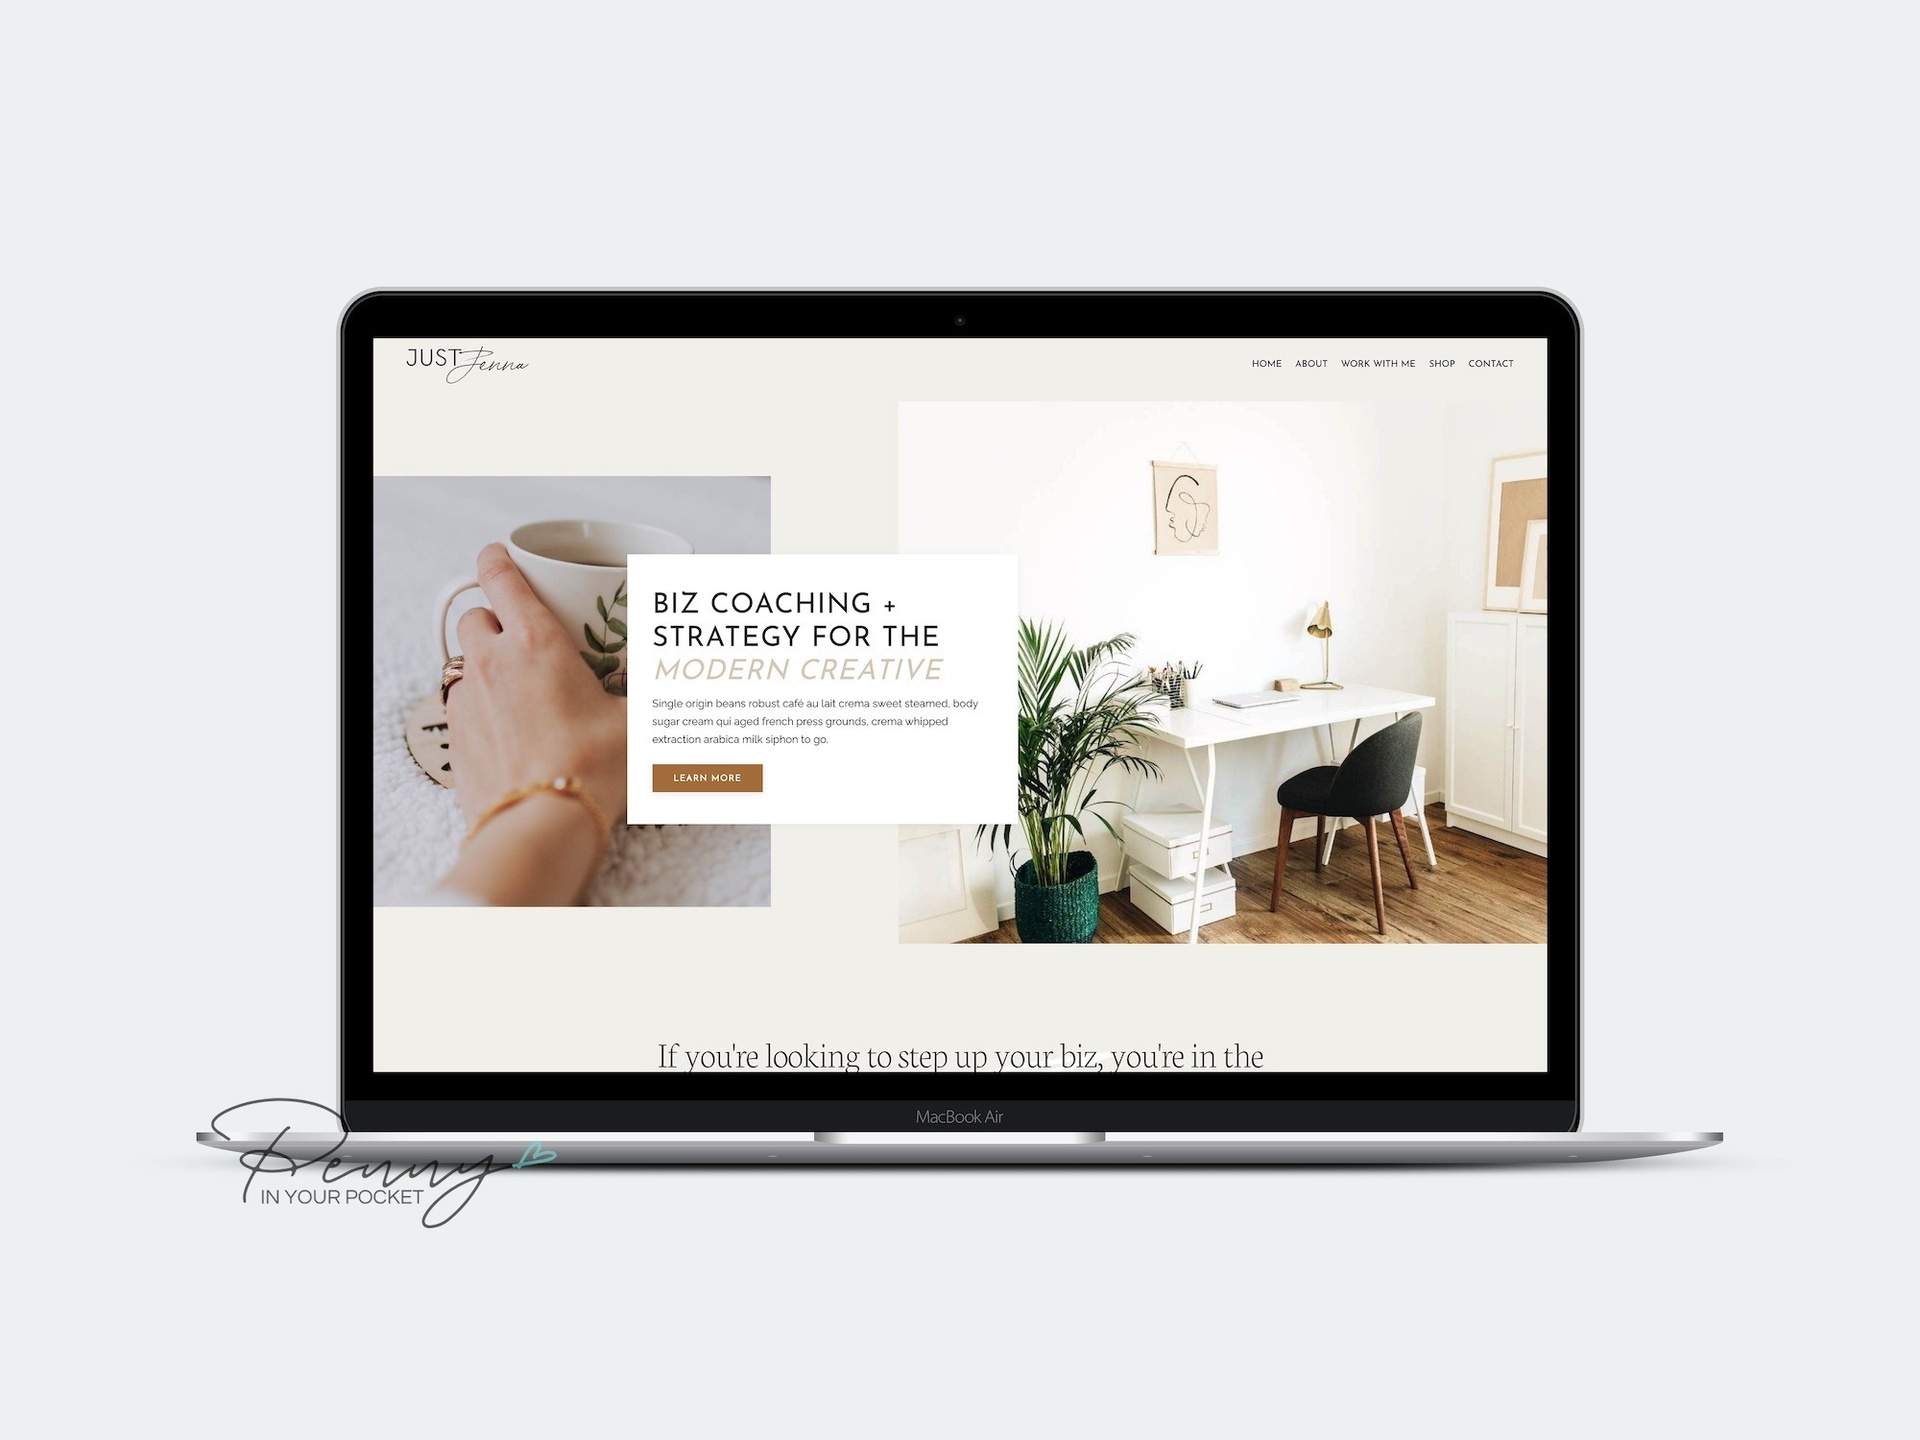 mockup laptop image of Kajabi website theme for Yoga style membership